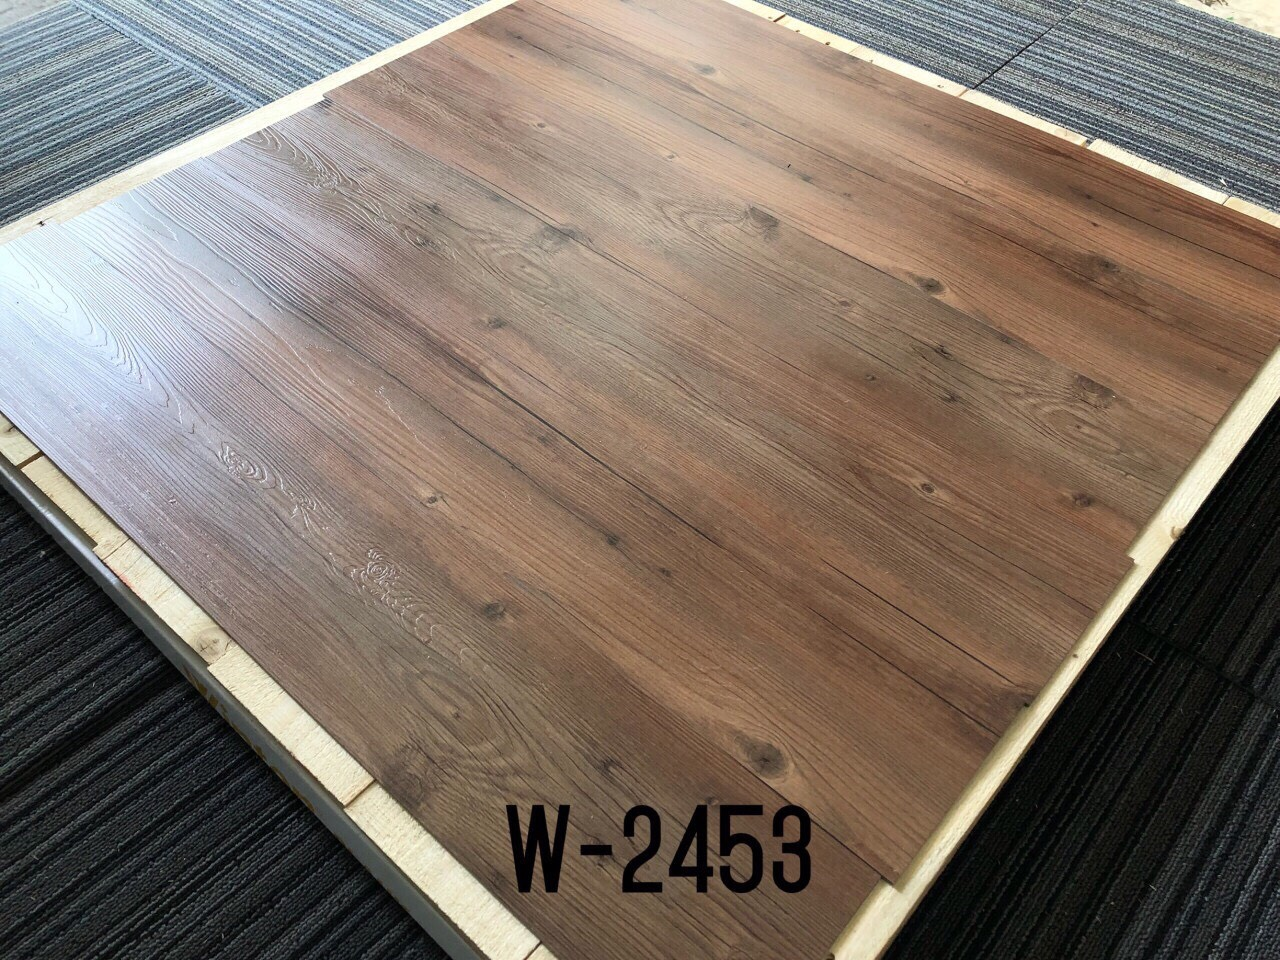 Sàn nhựa vân gỗ Nanolife 3mm W2453